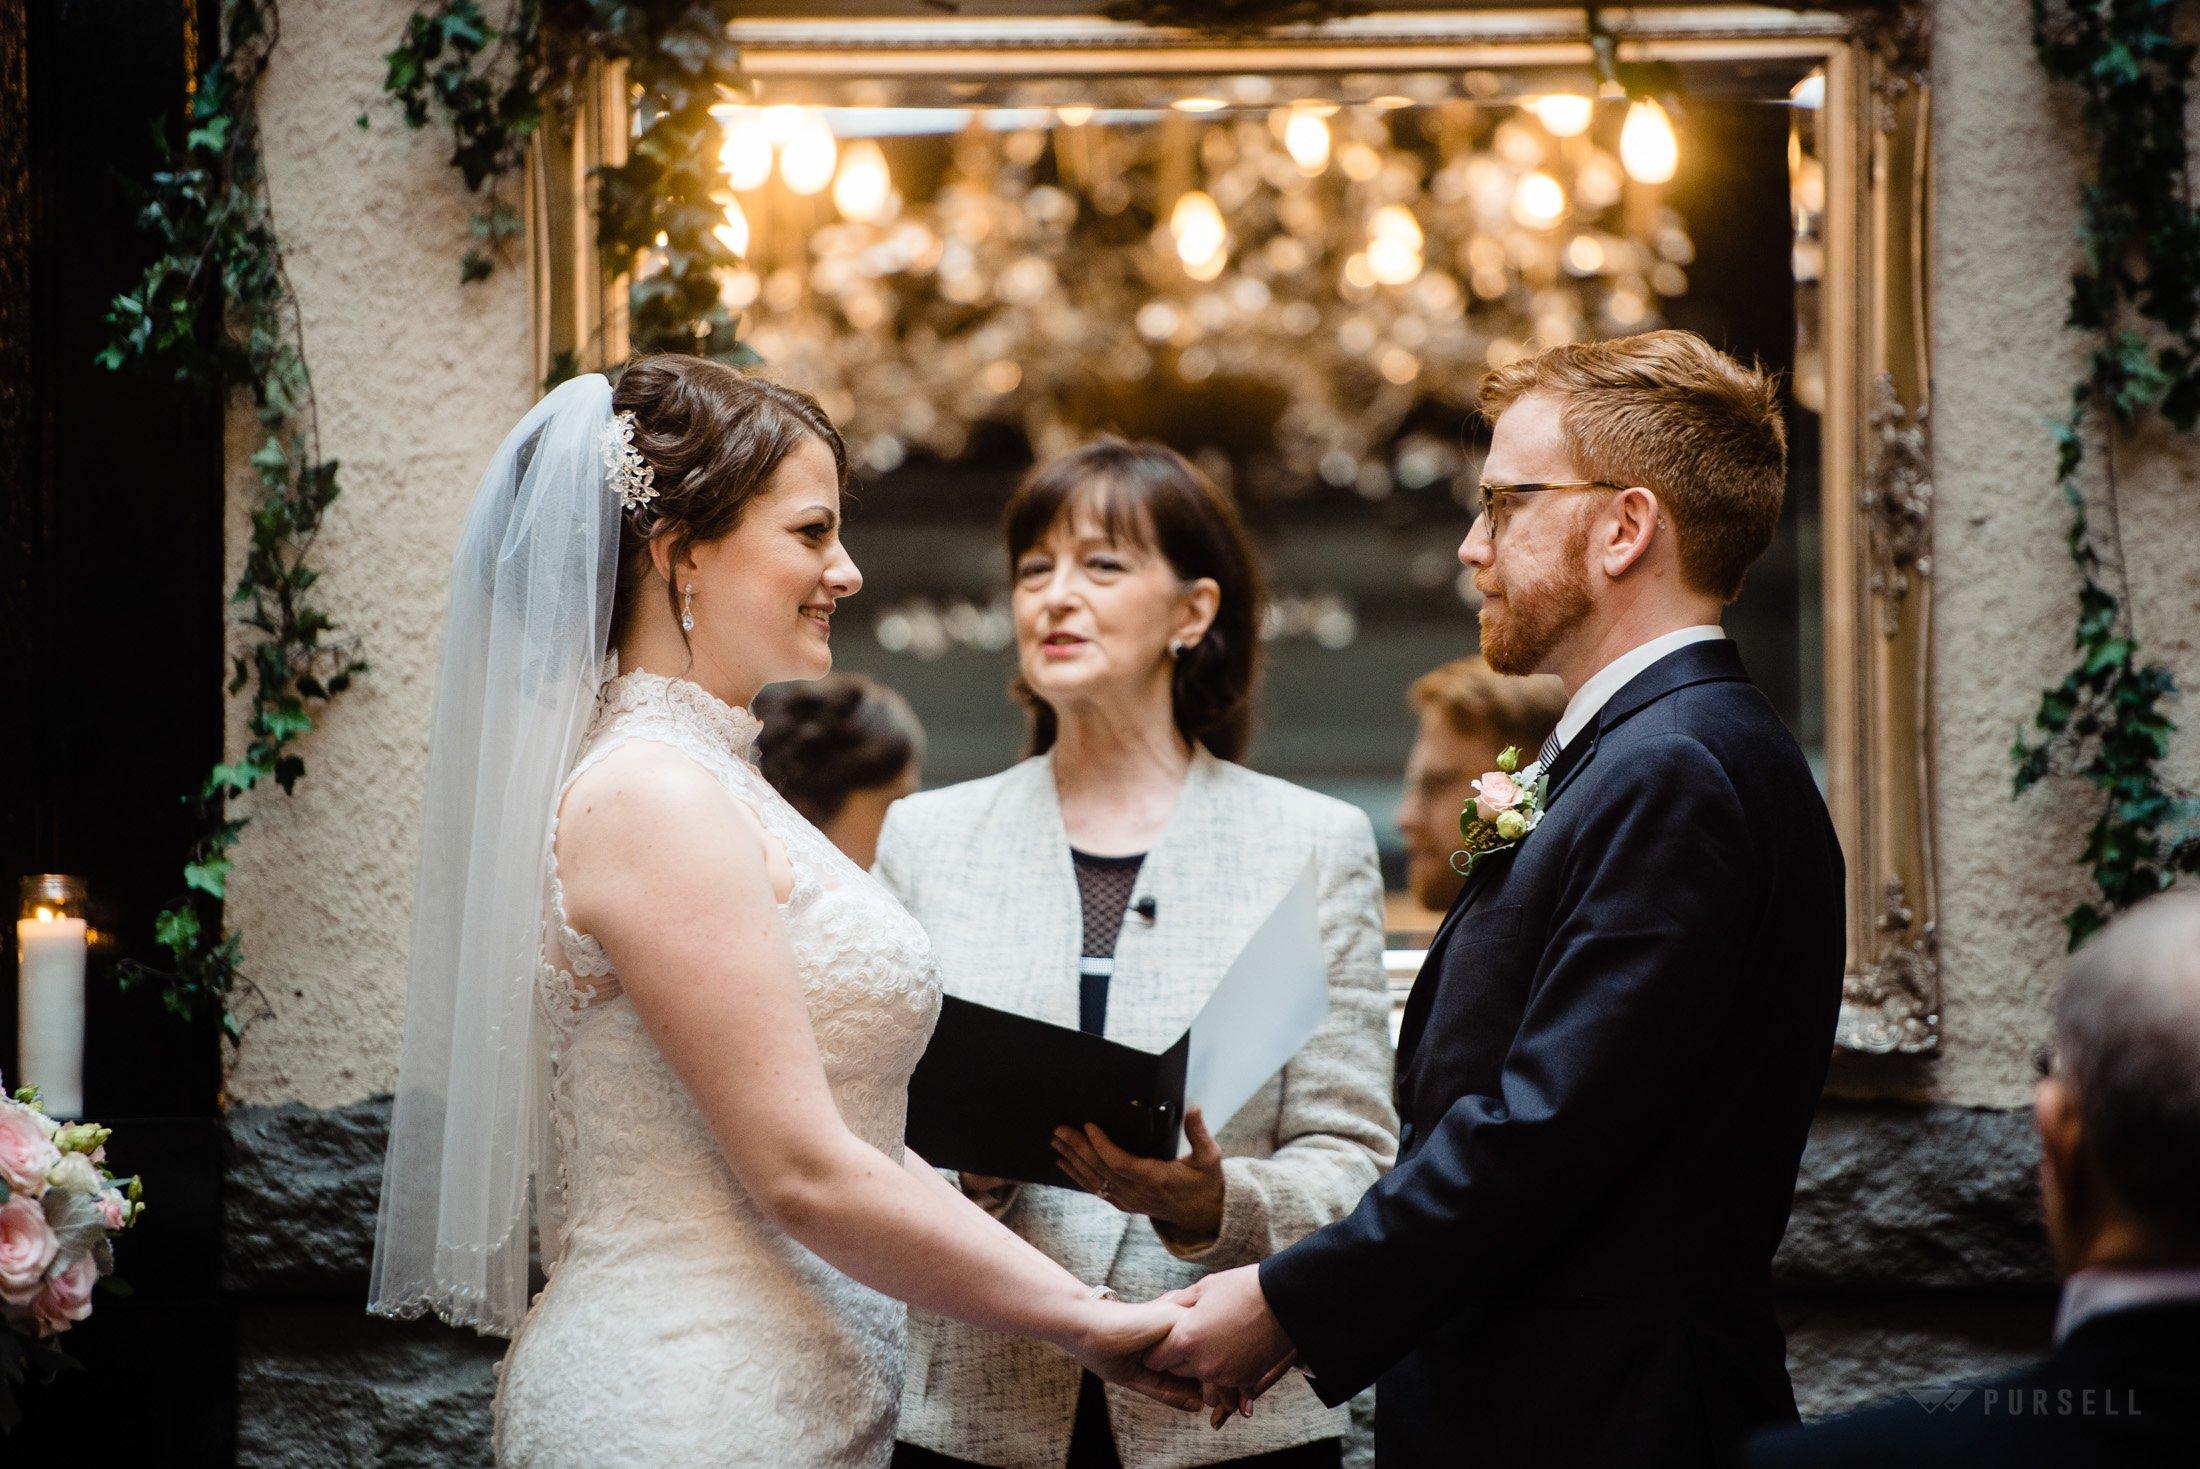 024 - wedding brix and mortar wedding